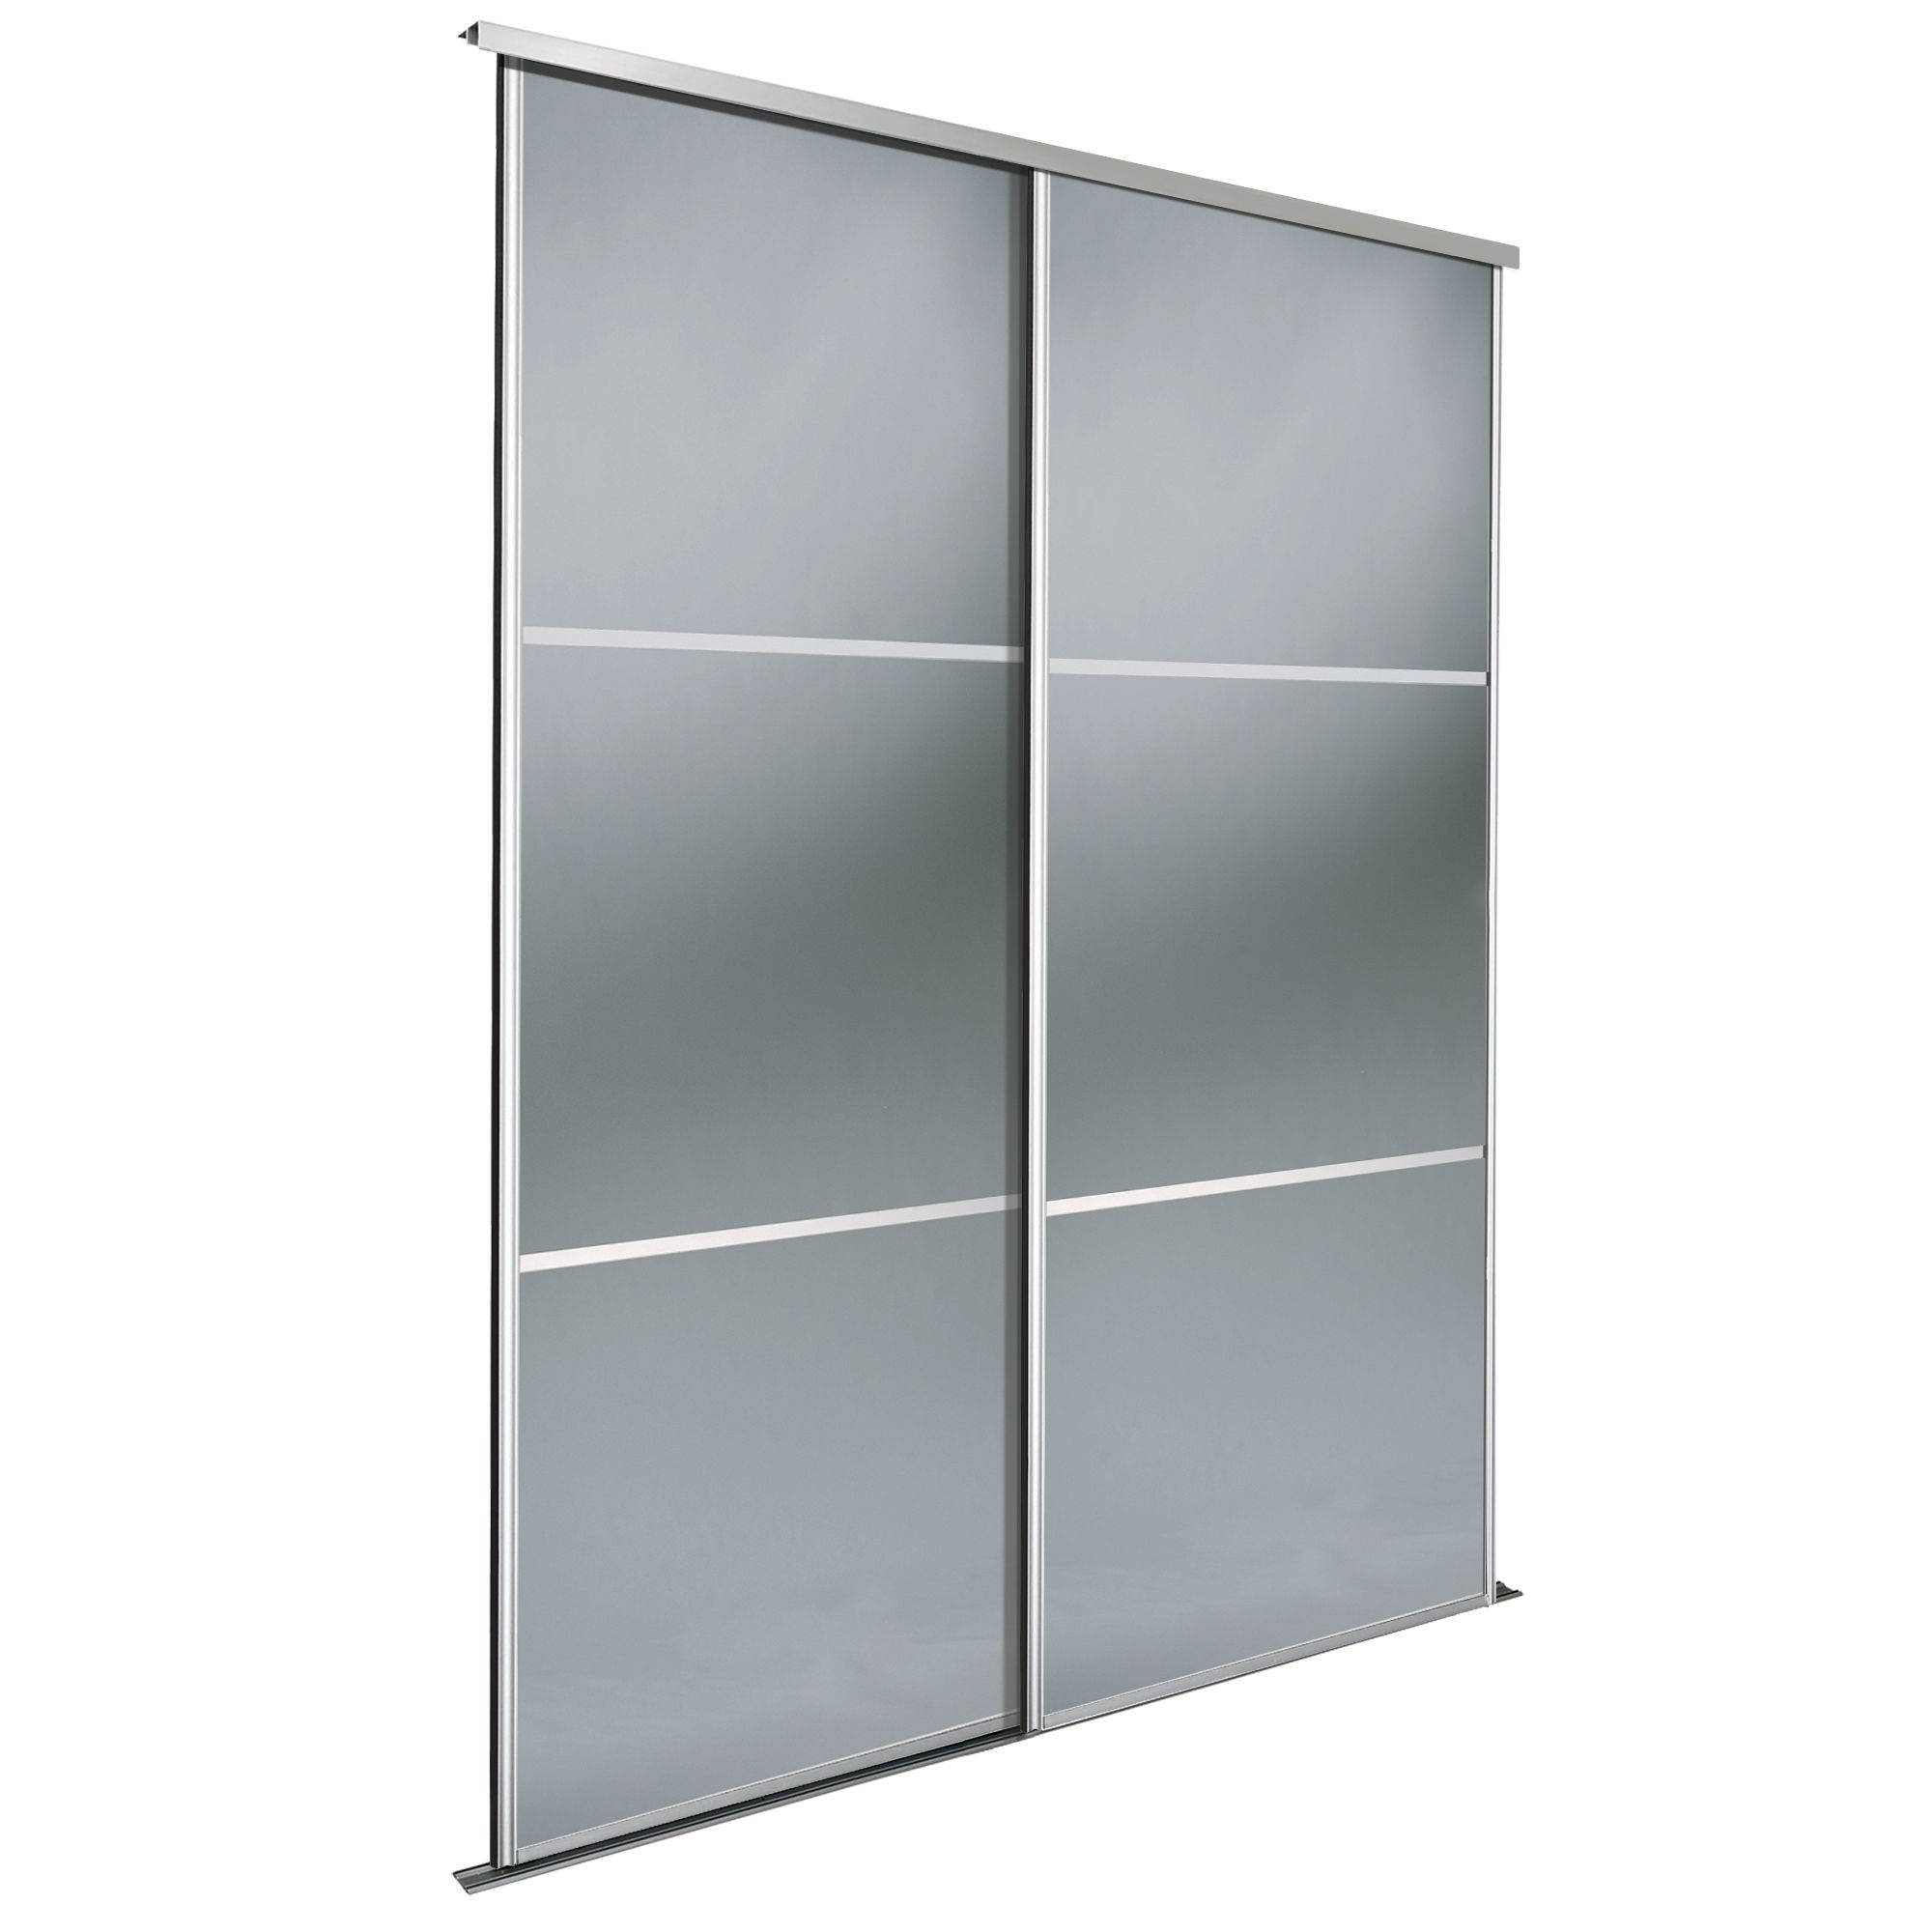 Premium Select Silver Smoked Mirror Sliding Wardrobe Door Kit (h)2220 Mm (w)762 Mm, Pack Of 2